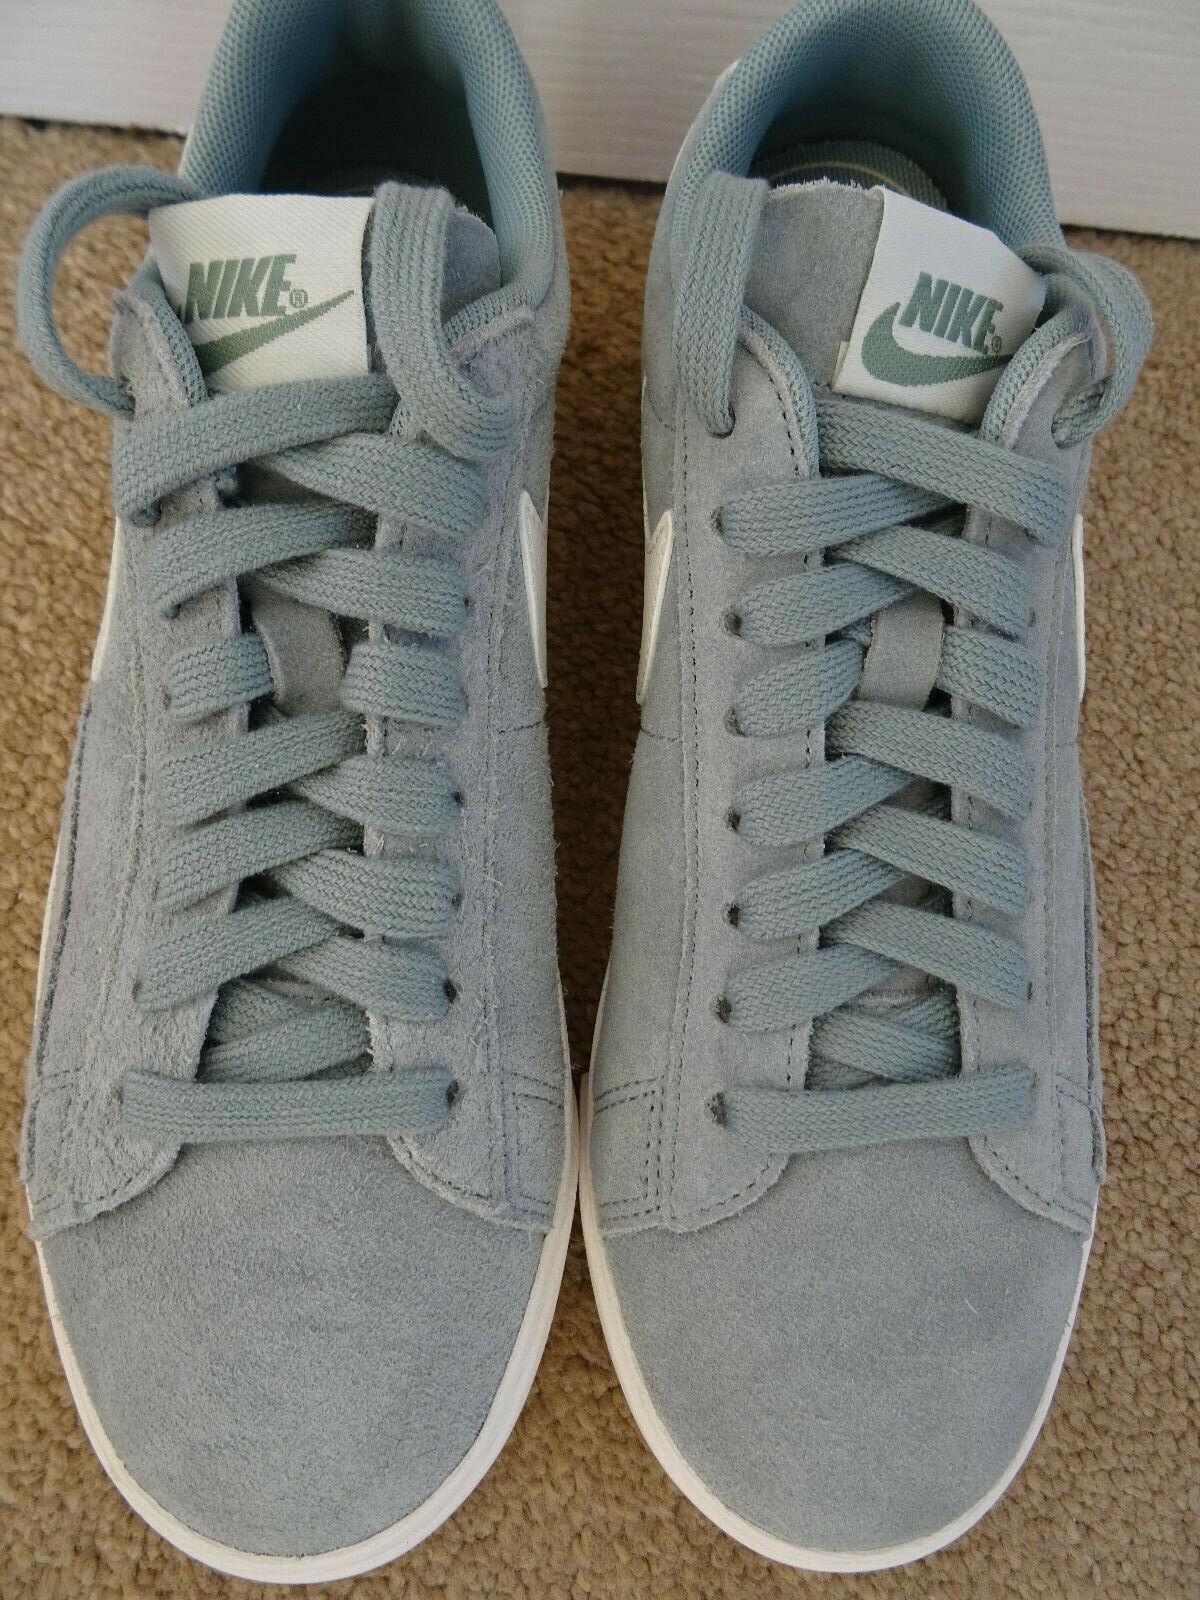 Nike blazer basso sd donne donne donne formatori scarpe av9373 302 ue 37,5 noi 6,5 nuovi   box | Di Qualità Fine  754b87